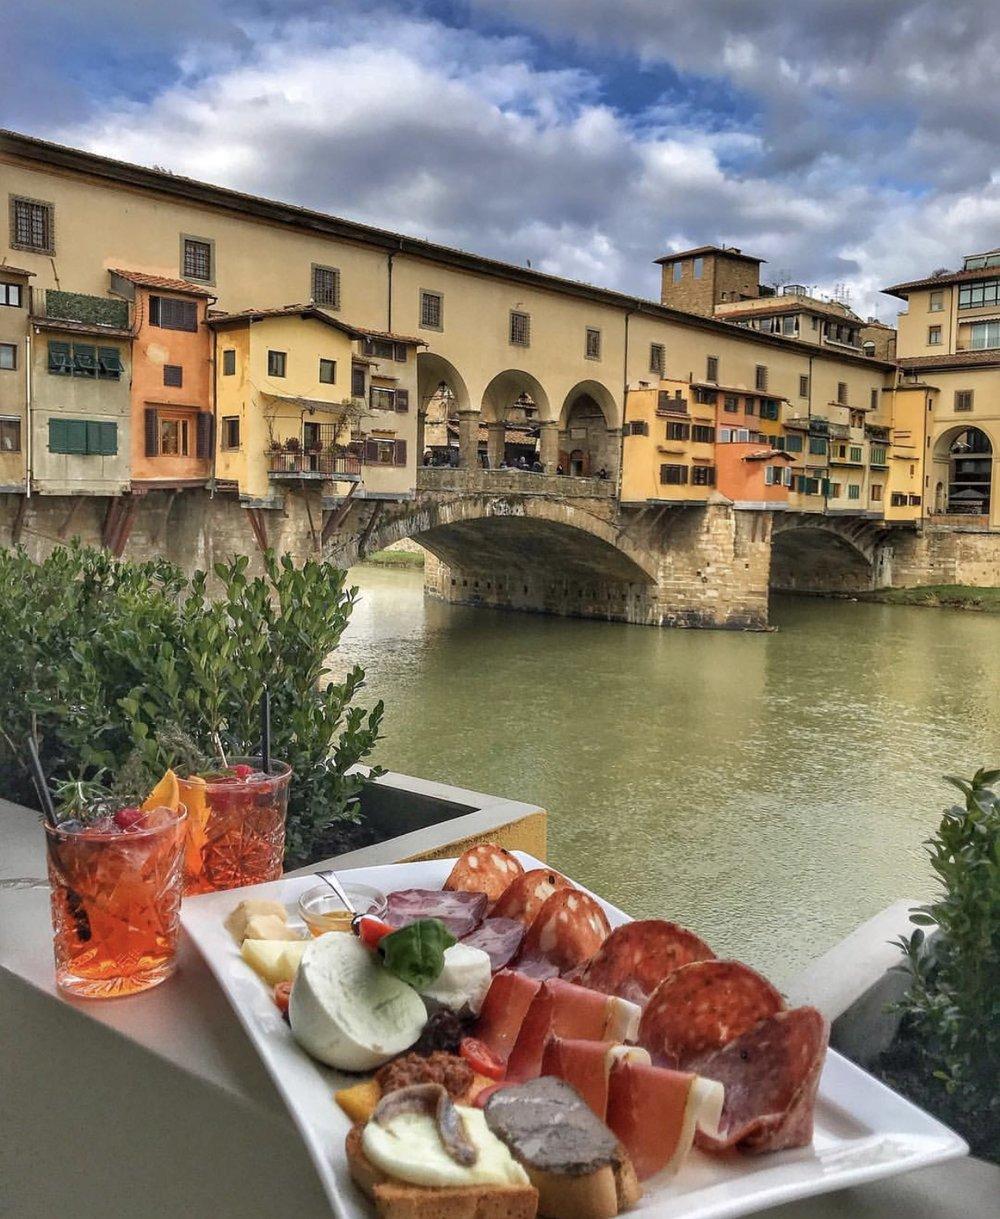 Via de' Bardi, 58/r, 50125 Firenze FI, Italy, +39 055 214502   Photo via @goldenview_firenze Instagram